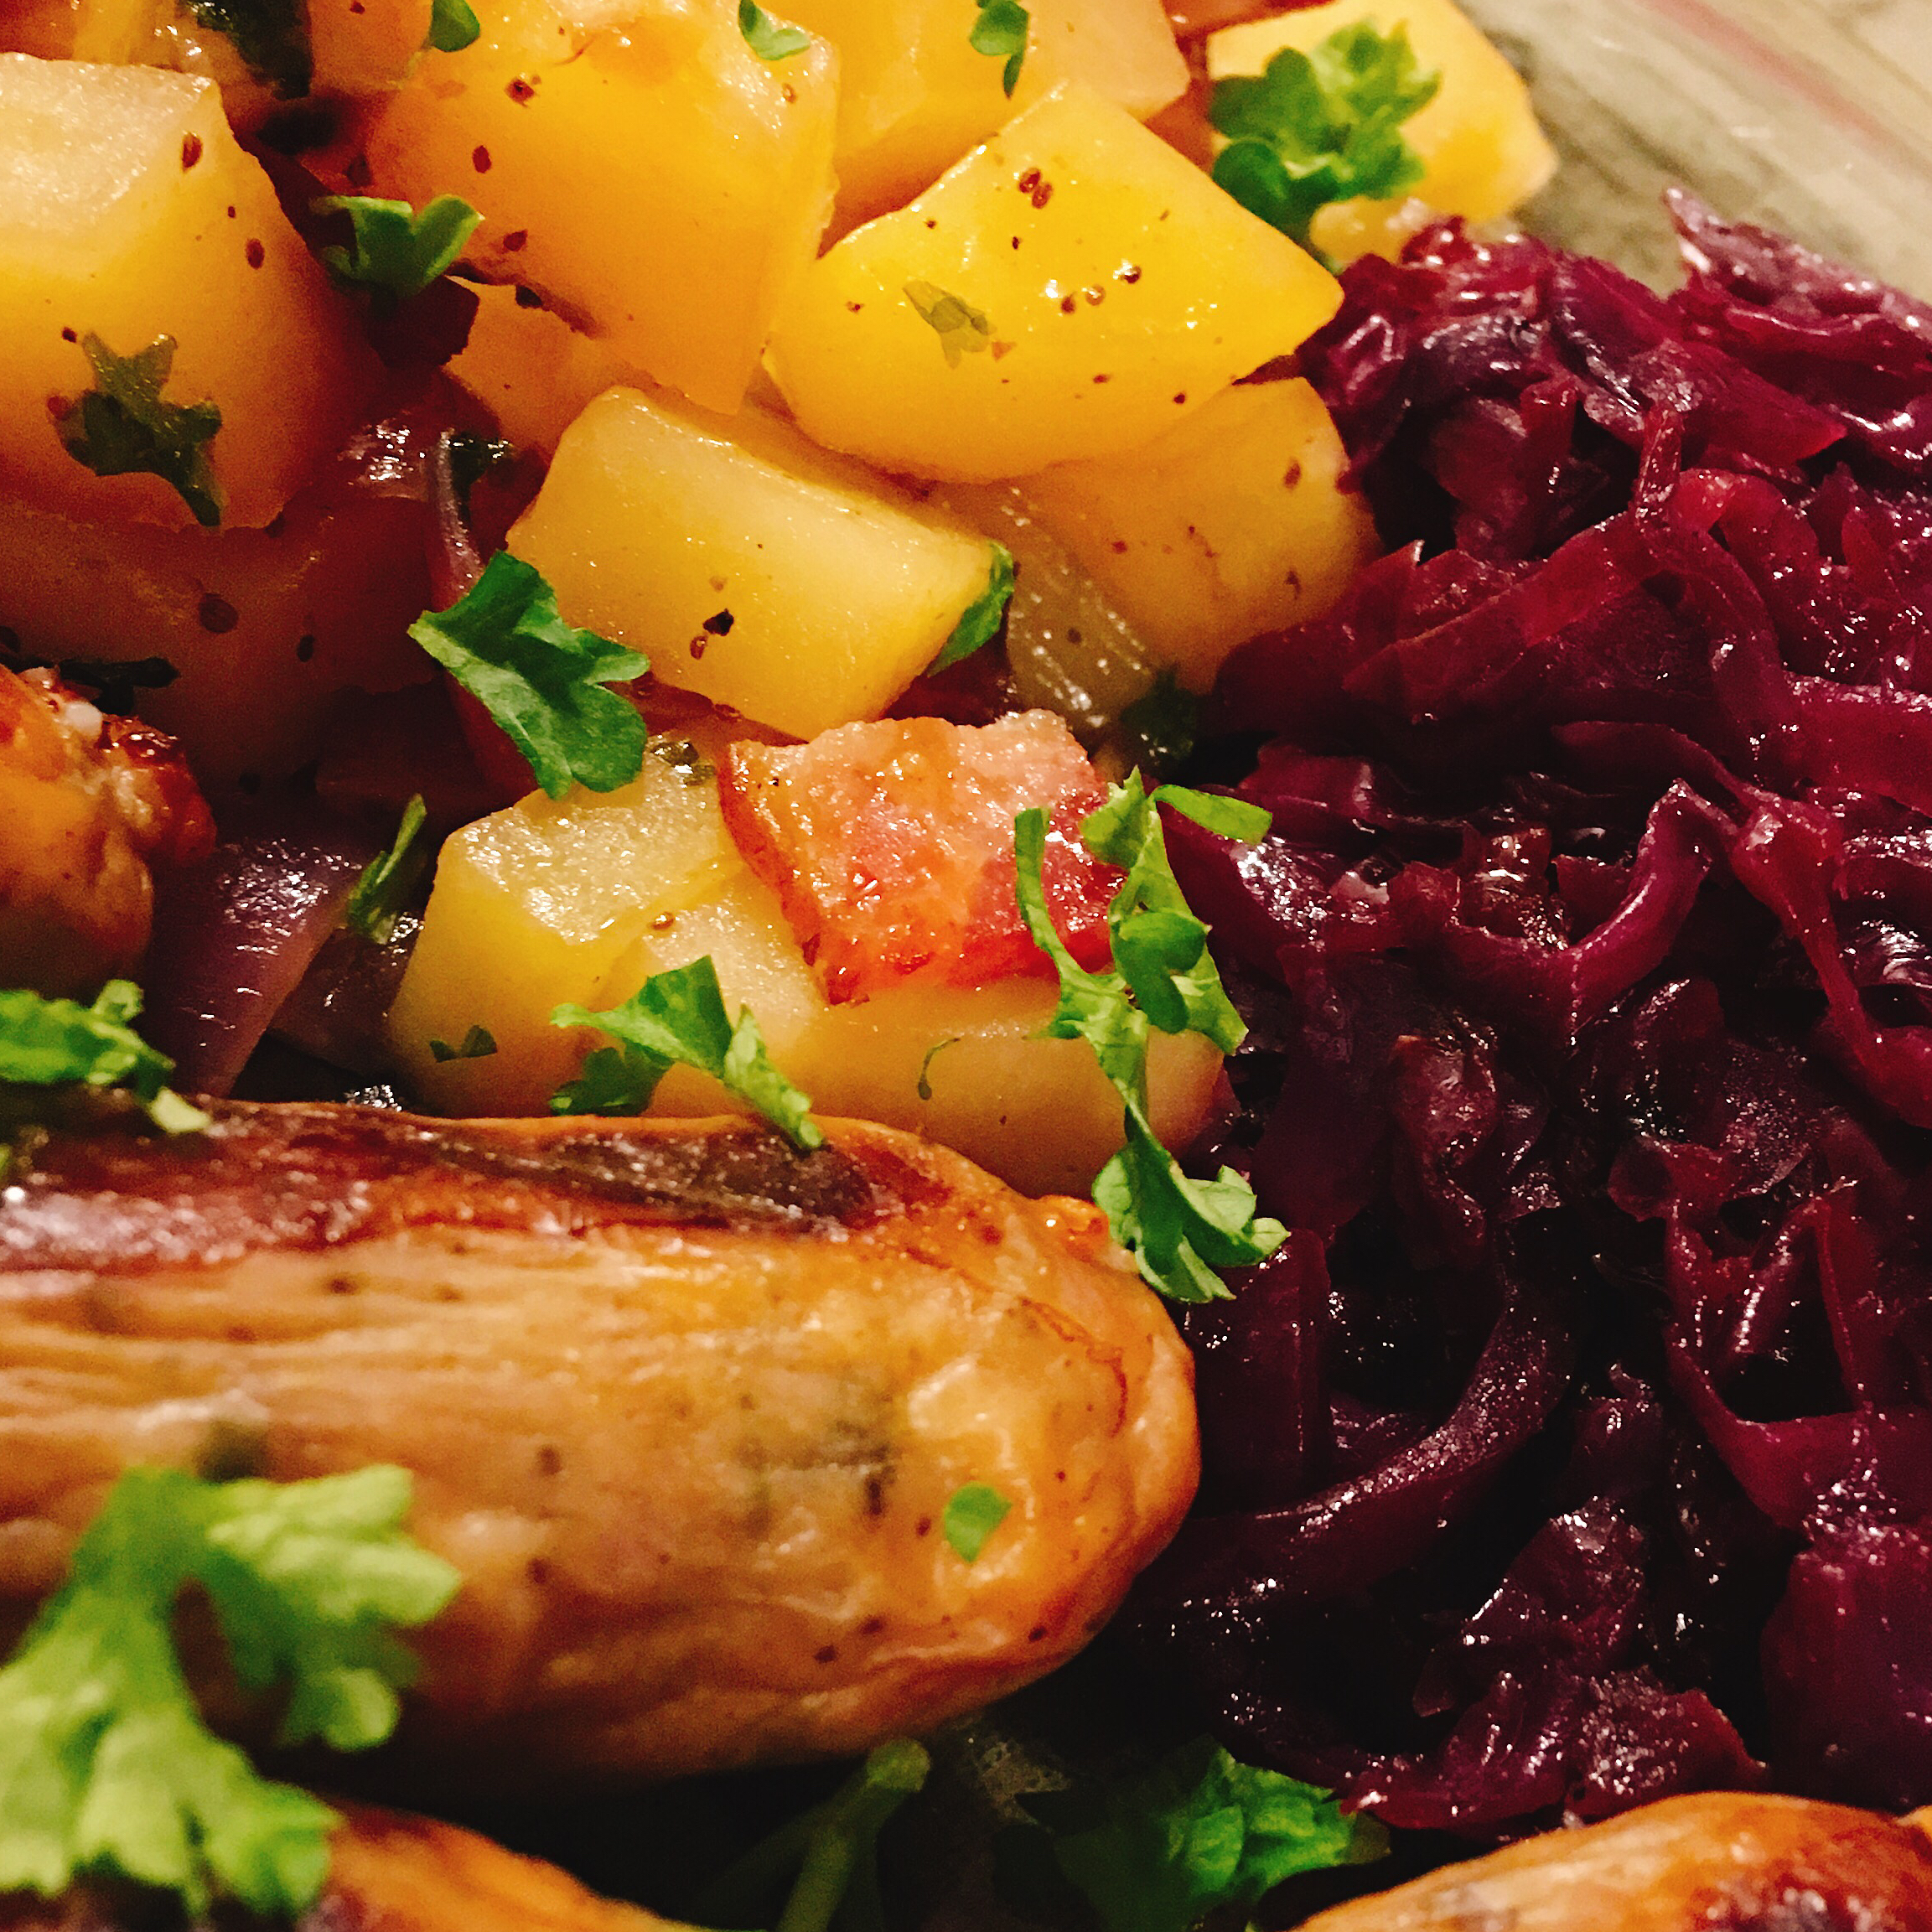 Grandma Jeanette's Amazing German Red Cabbage Vanessa Martens